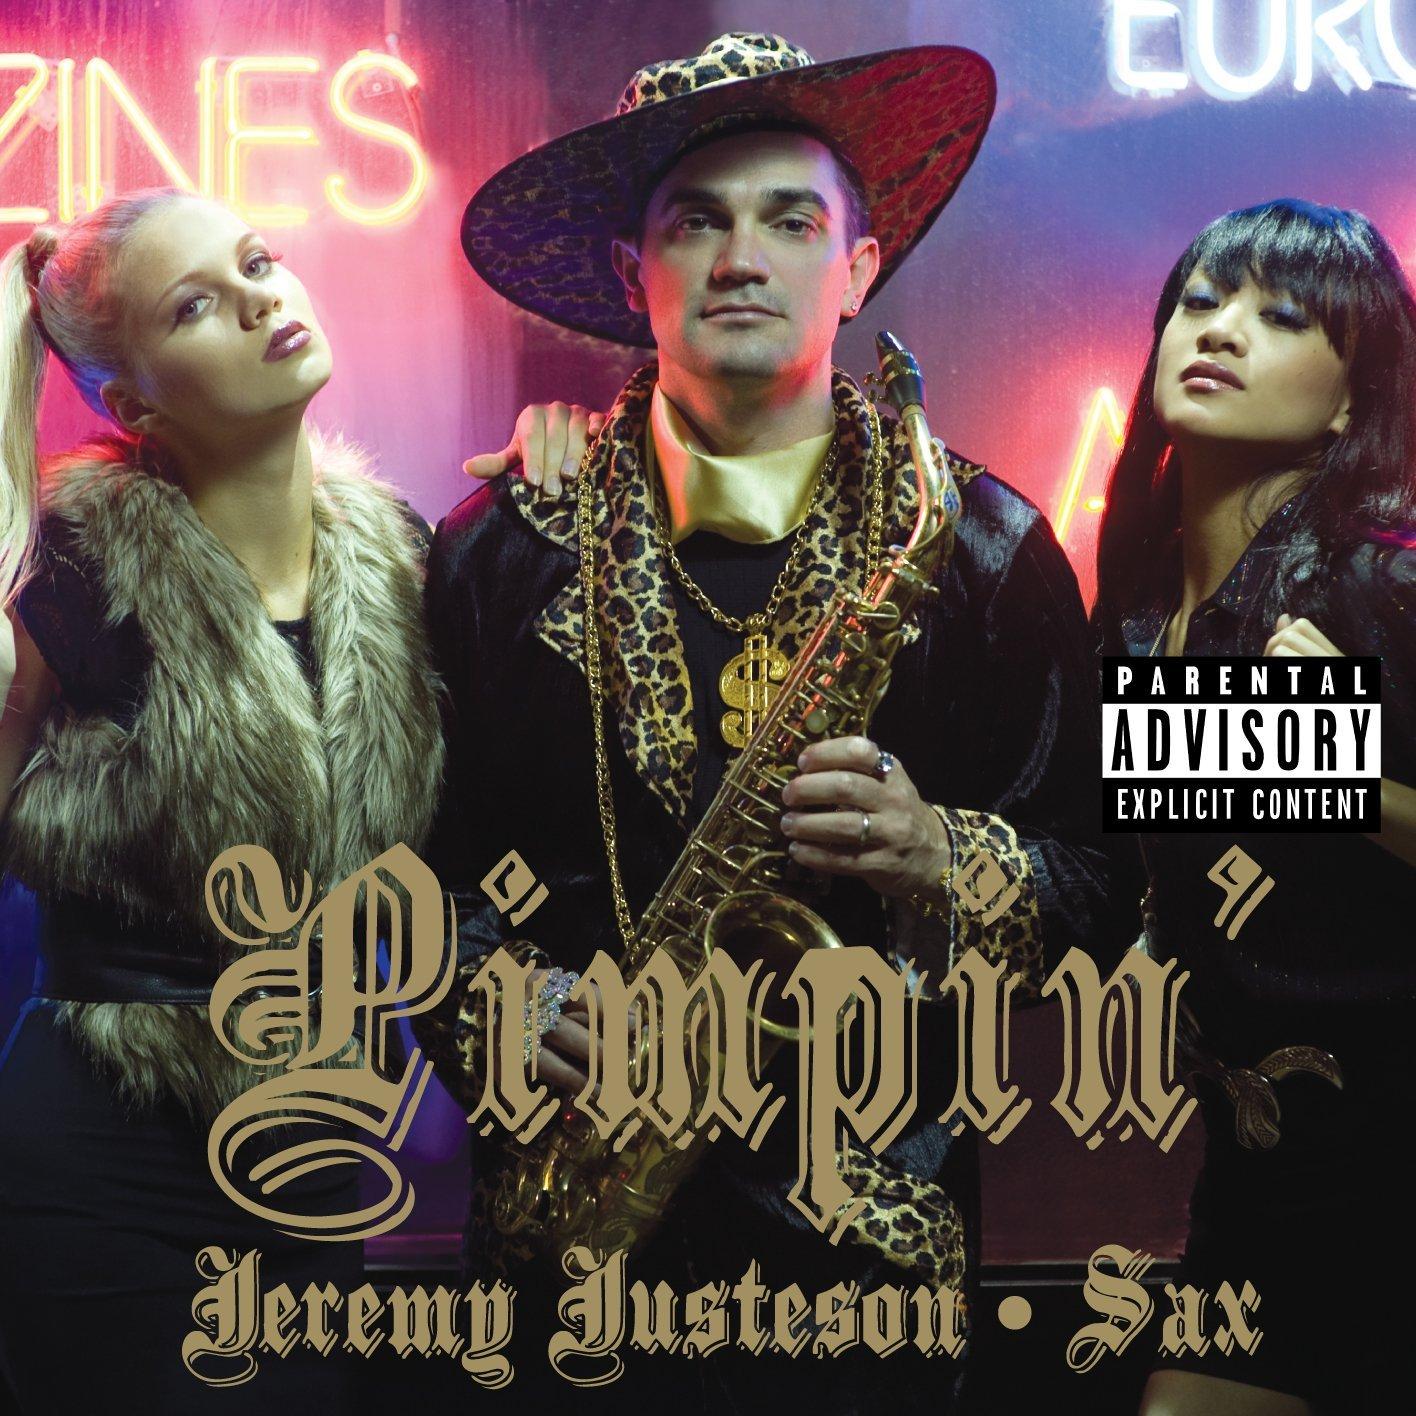 Jeremy Justeson: Pimpin'